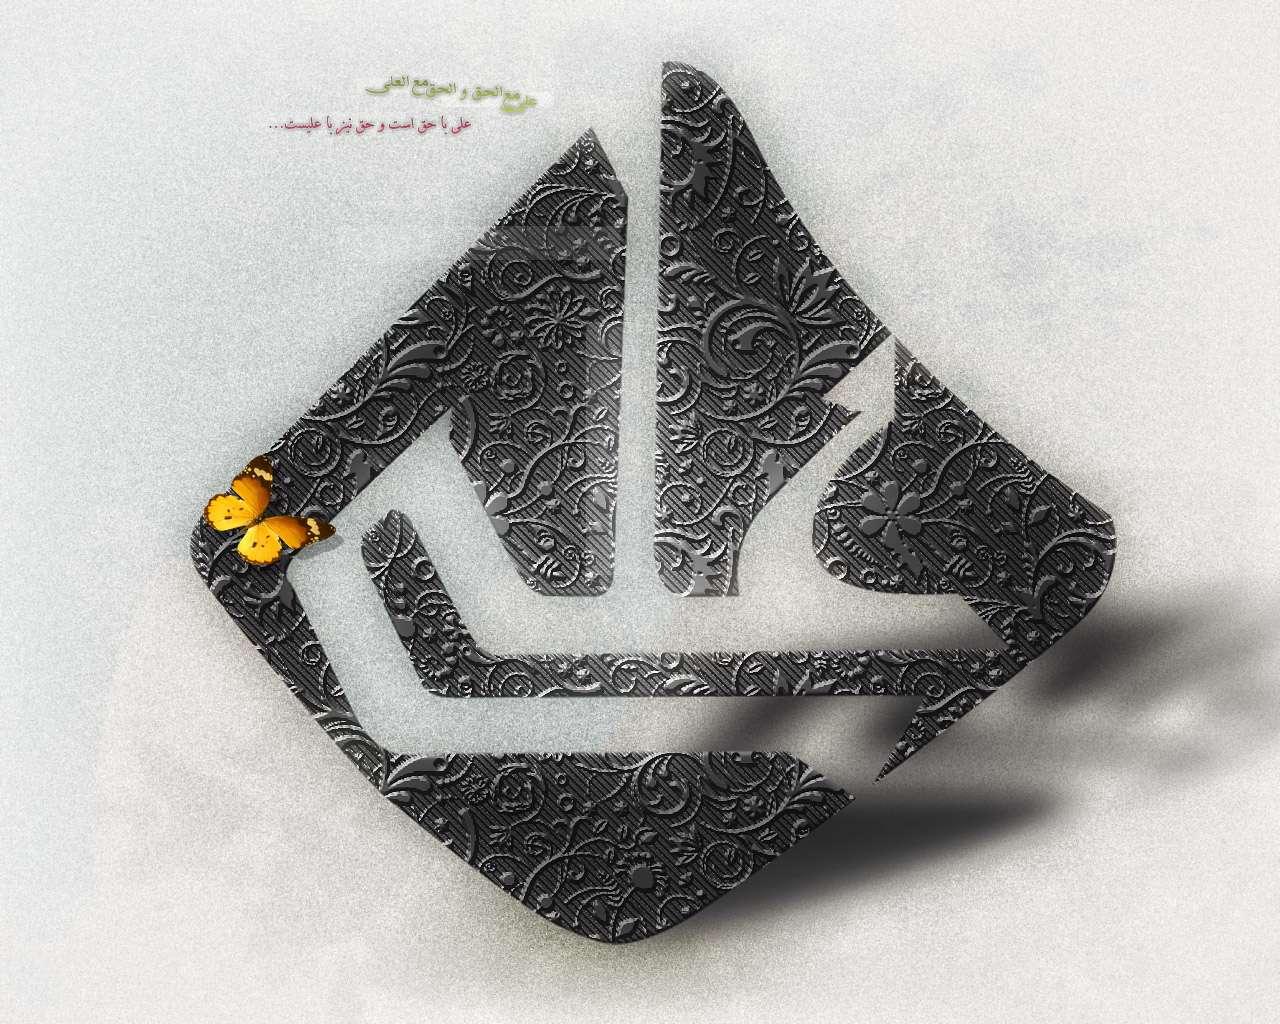 حیات عارفانه امام علی ع